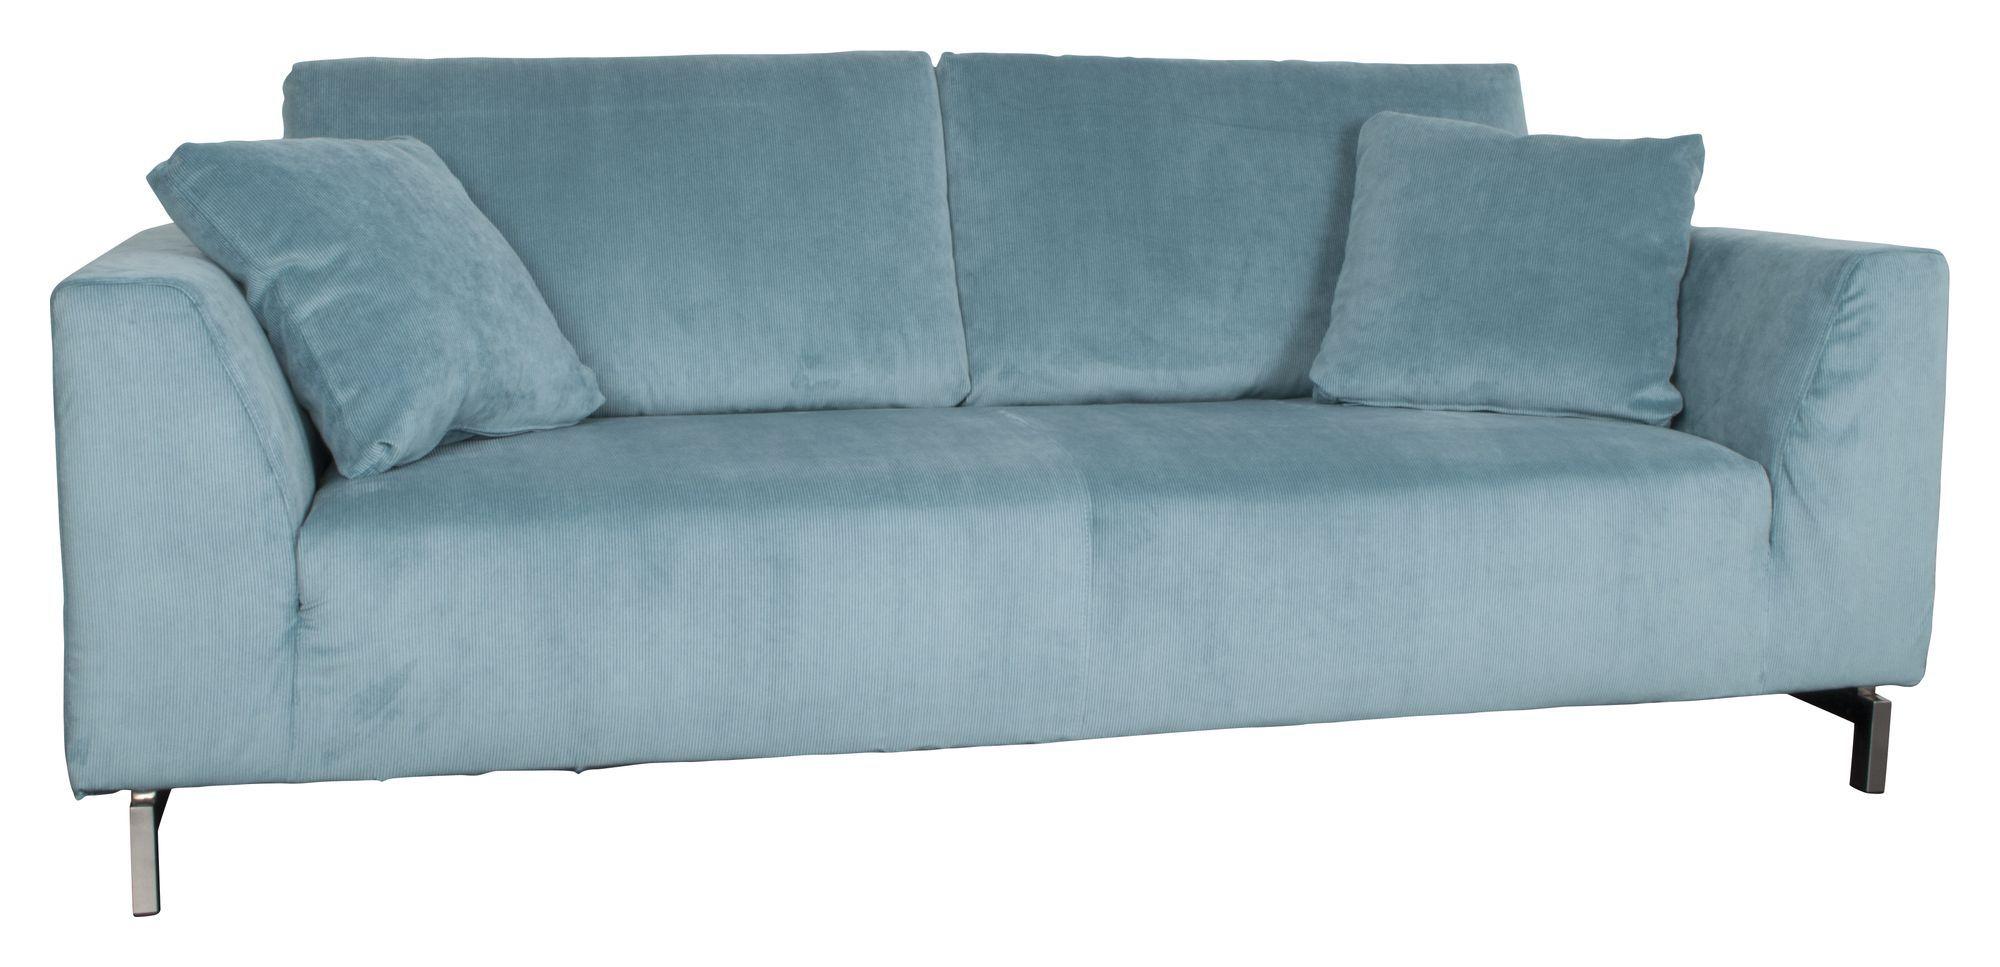 Zuiver Dragon 3-pers. sofa - Turkisblå fløjl